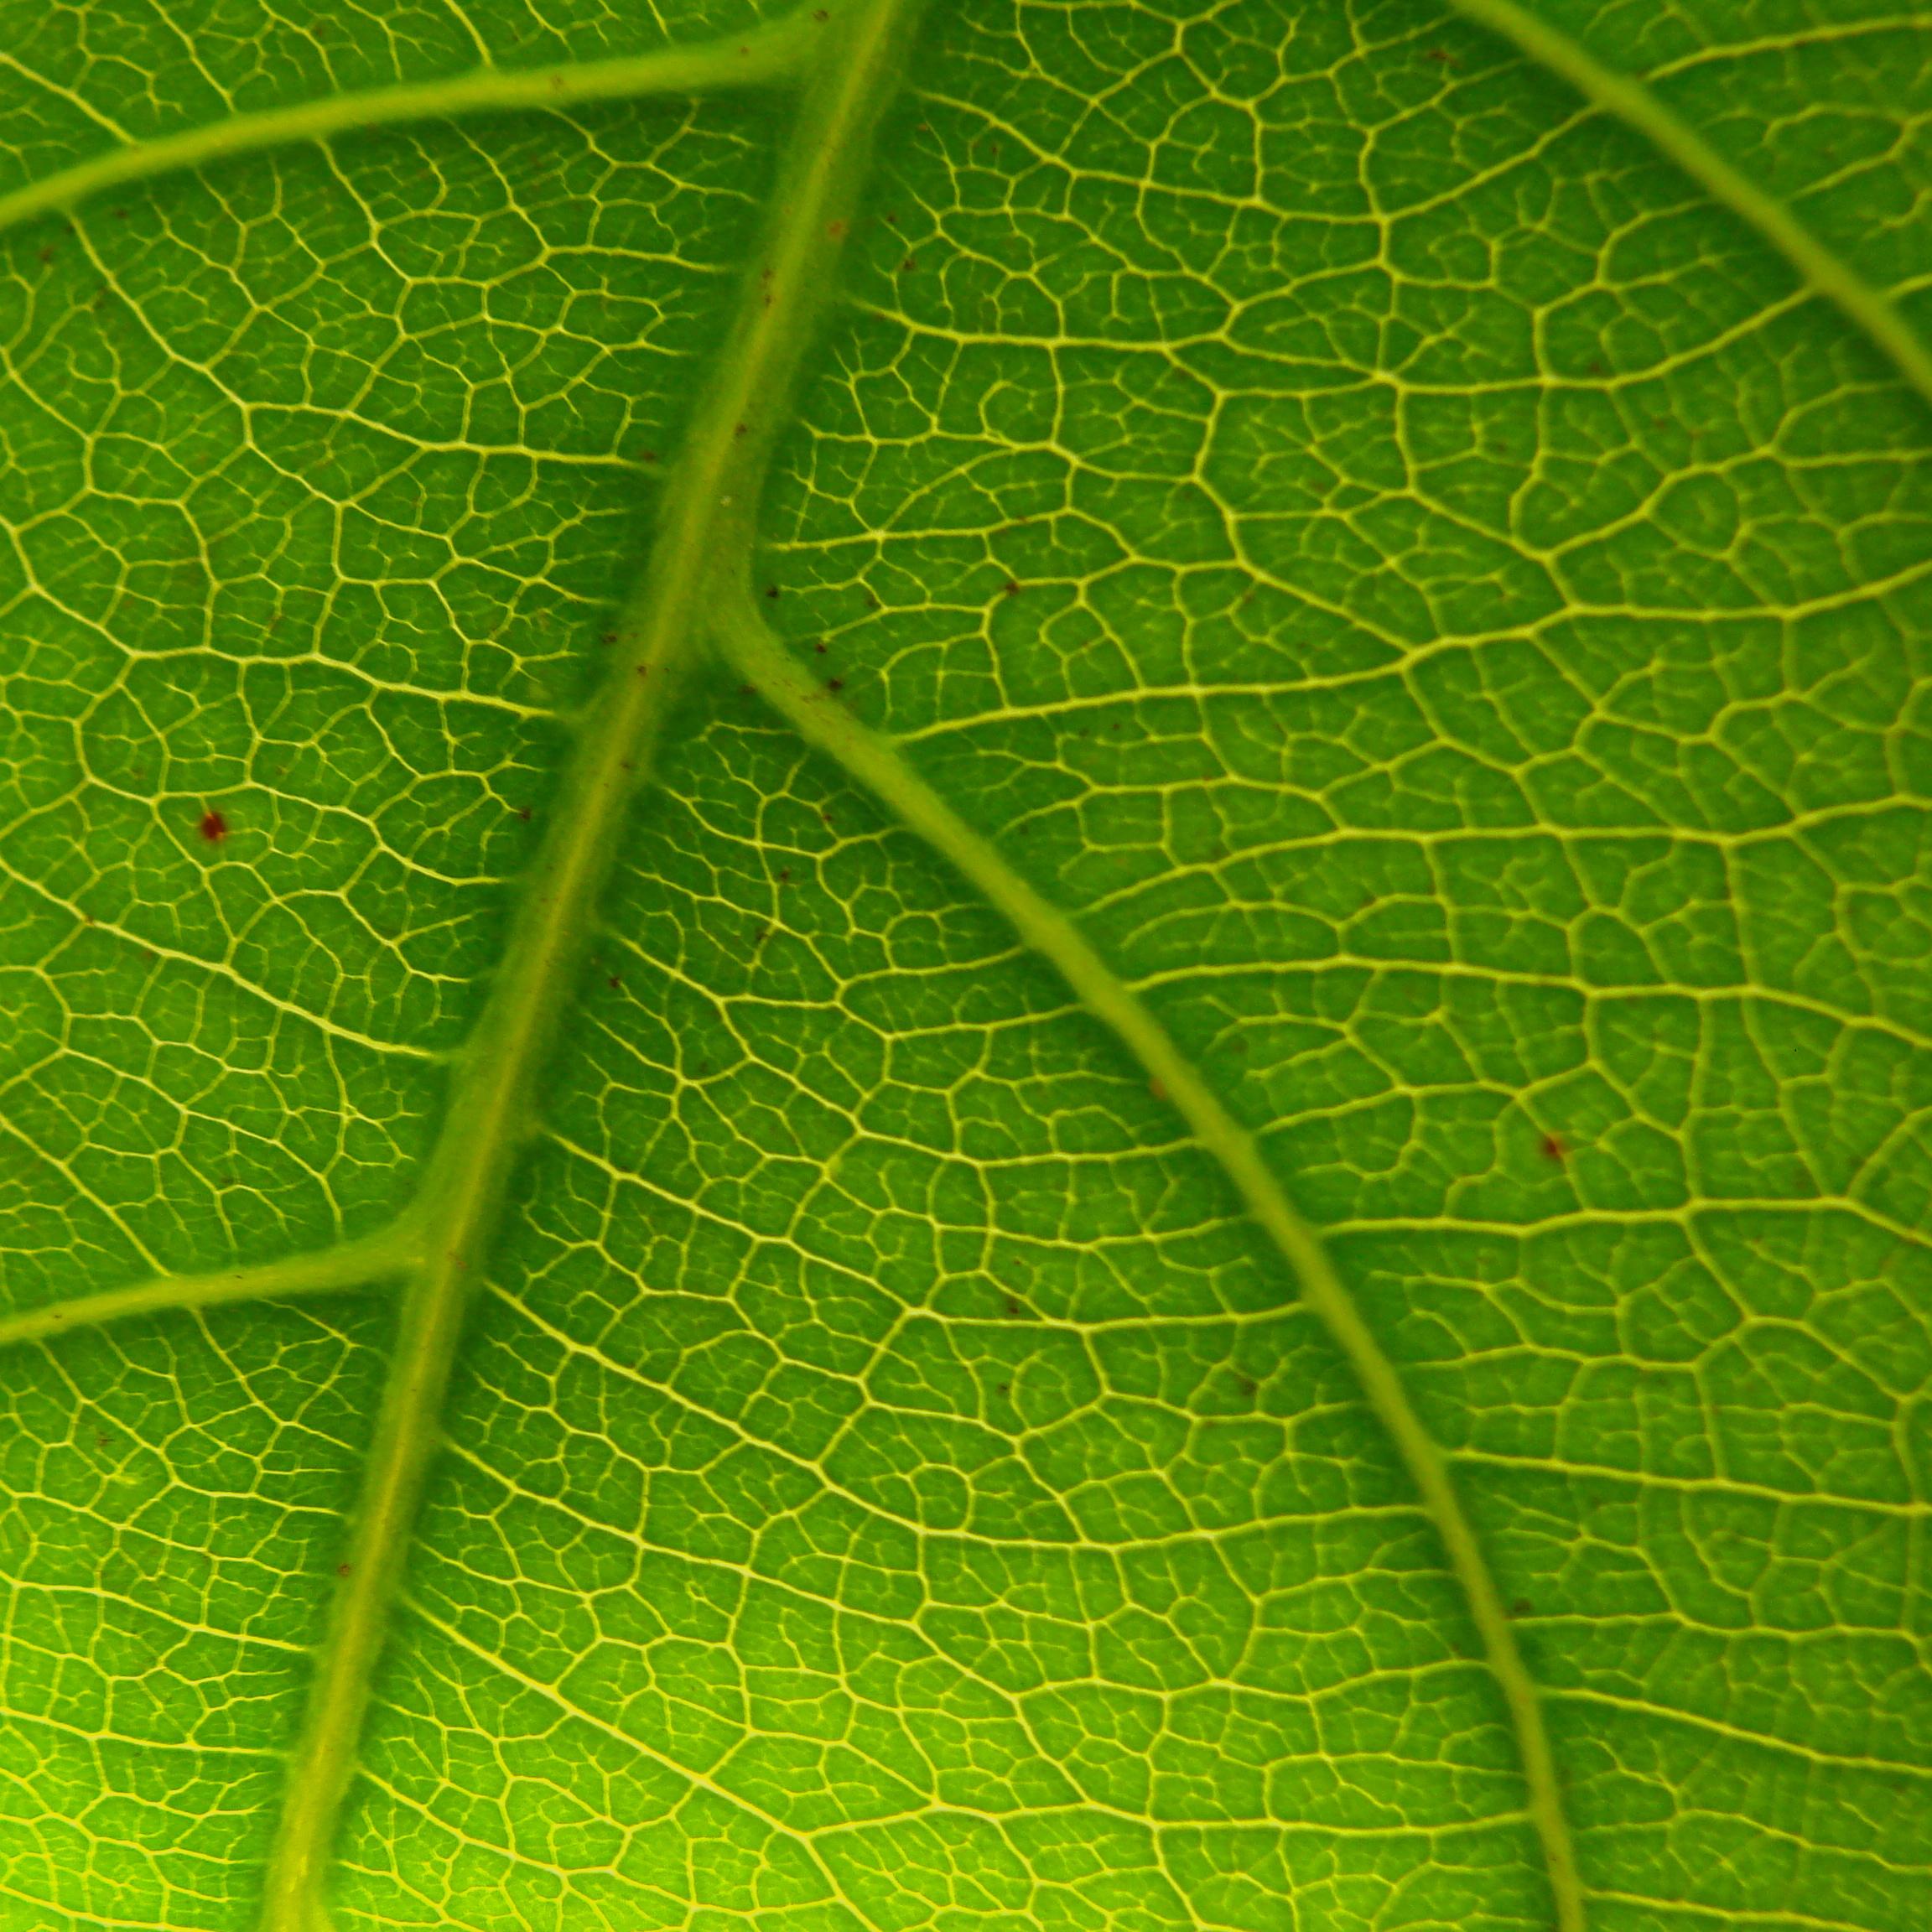 plant 1.JPG